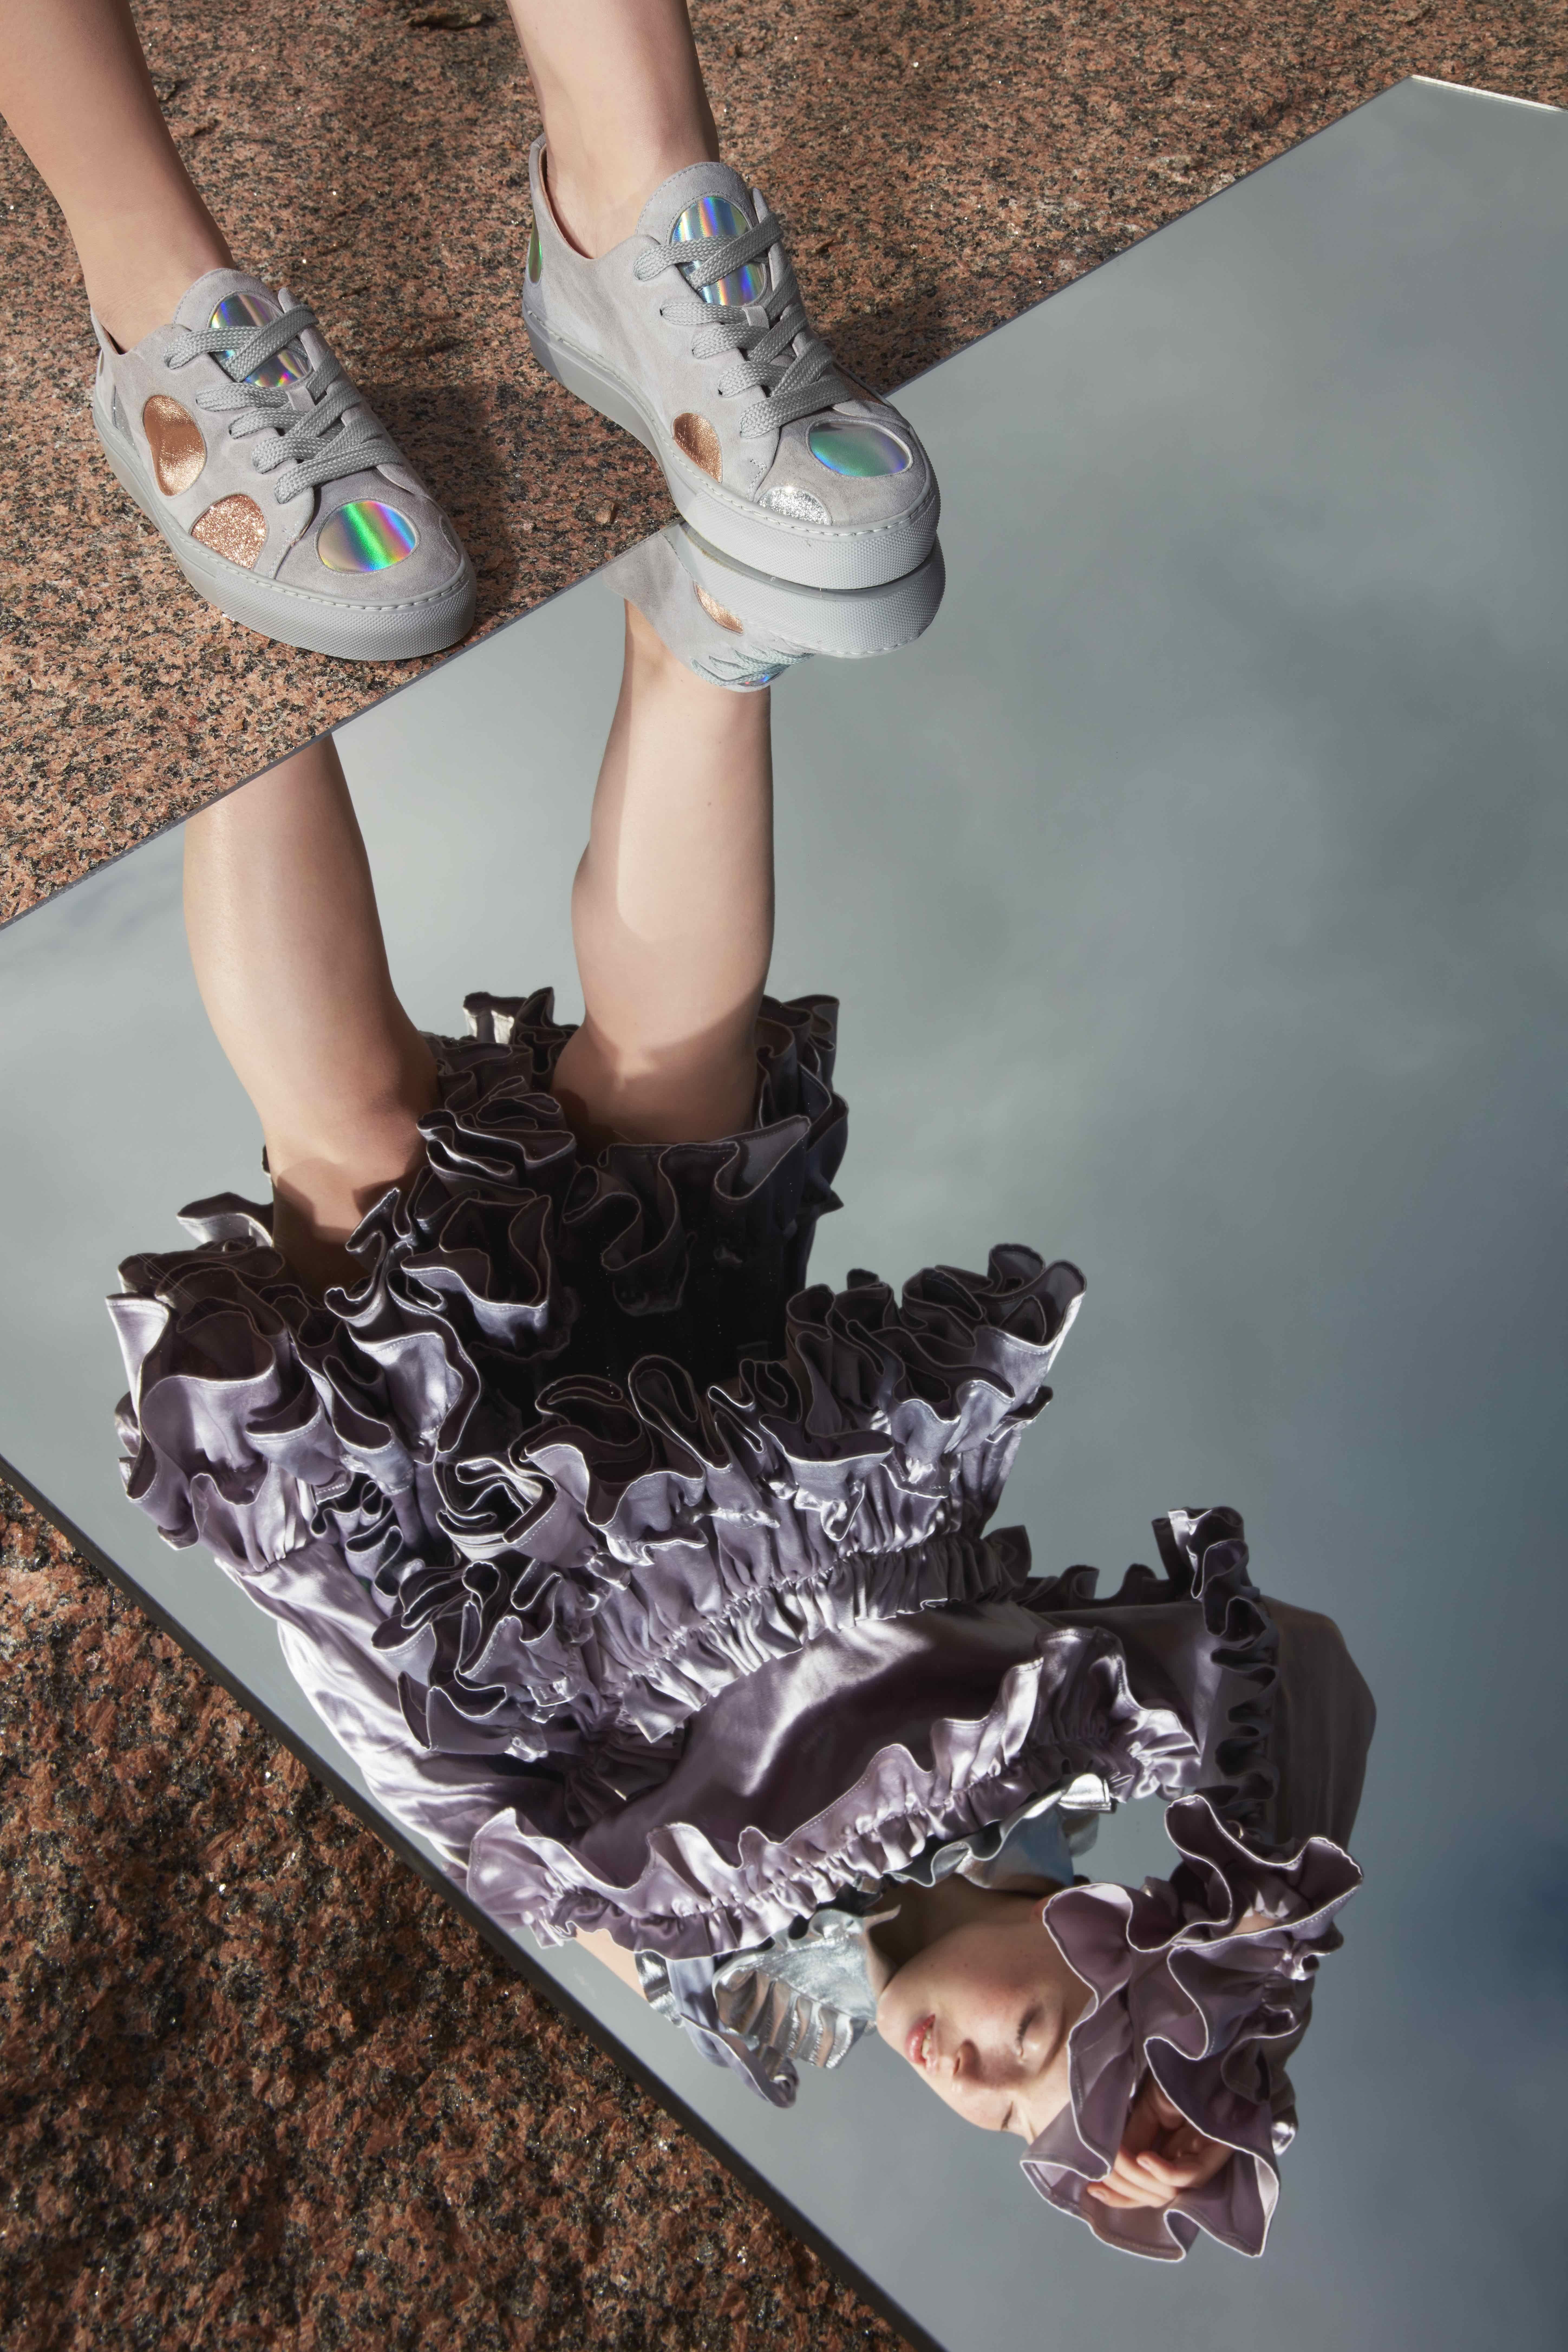 Eleanor Tomlinson (born 1992) recommendations